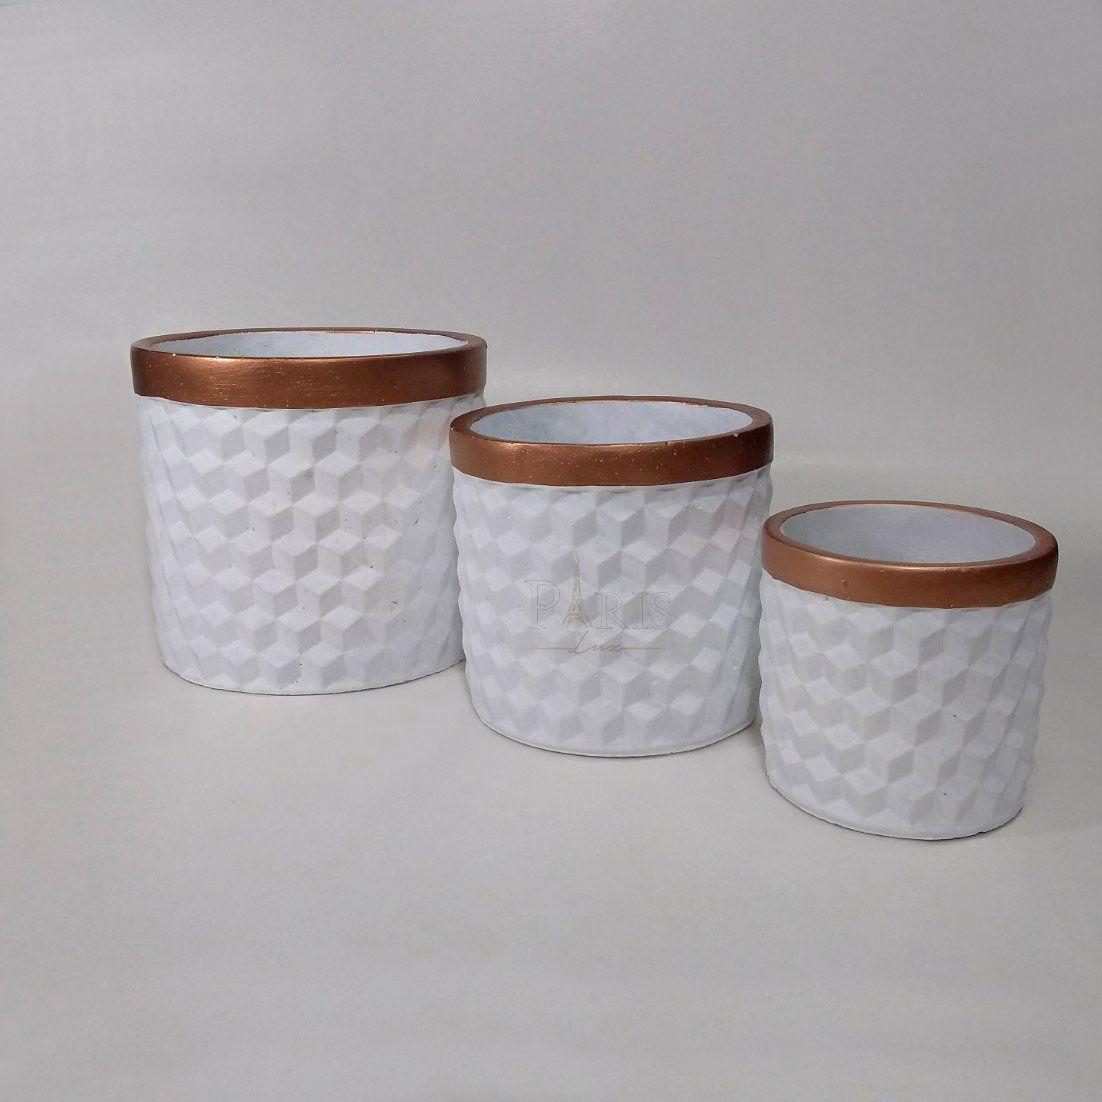 Cachepot Cimento Decorativo Branco Kit 3 Peças 8575